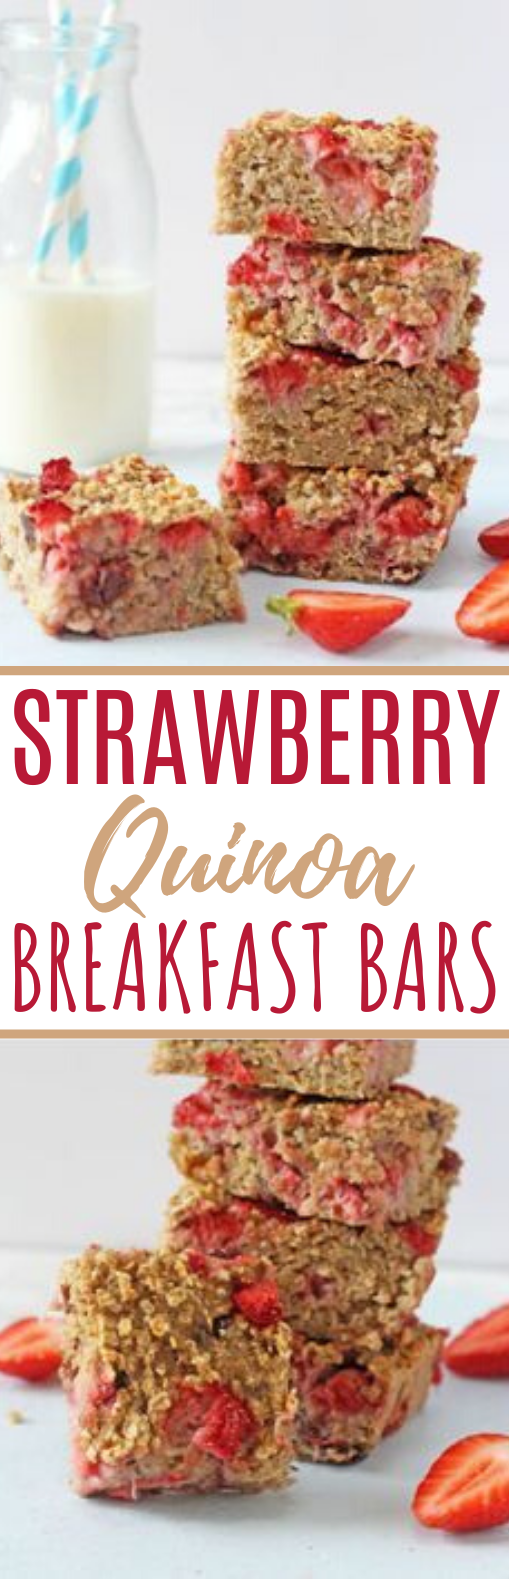 Strawberry Quinoa Breakfast Bars #healthy #breakfast #diet #vegetarian #mealprep